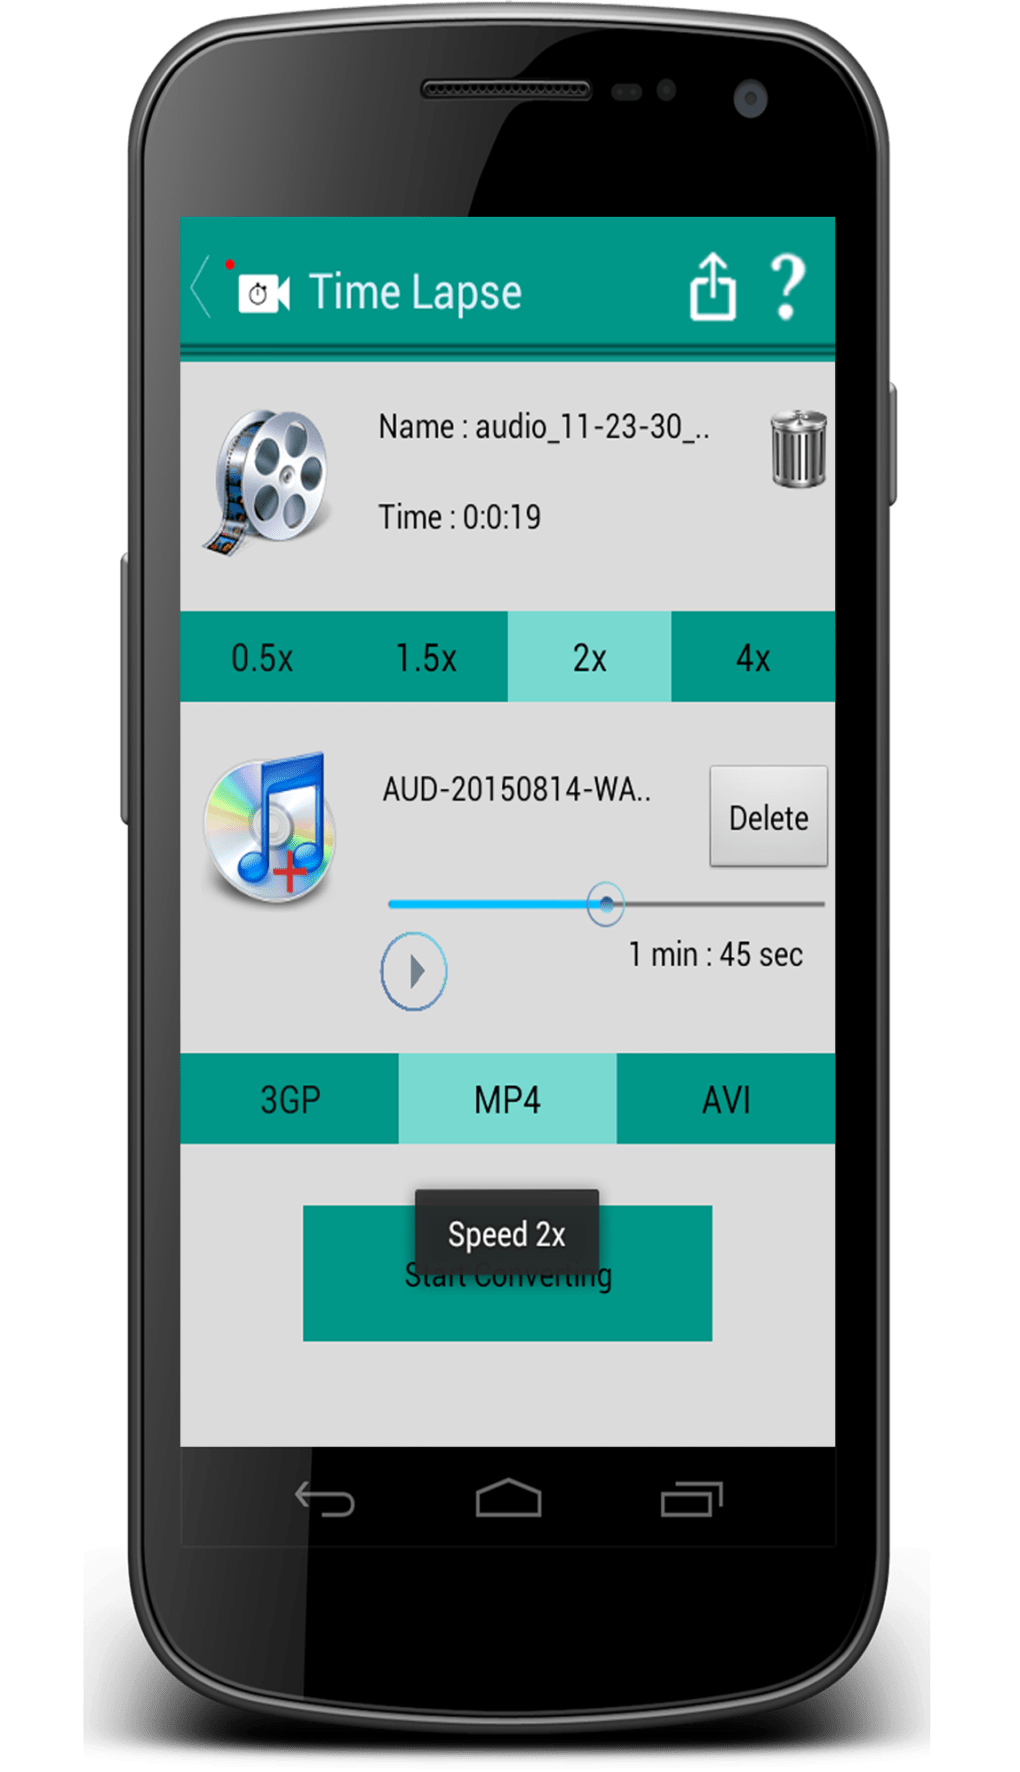 Time lapse App android apk apkpure